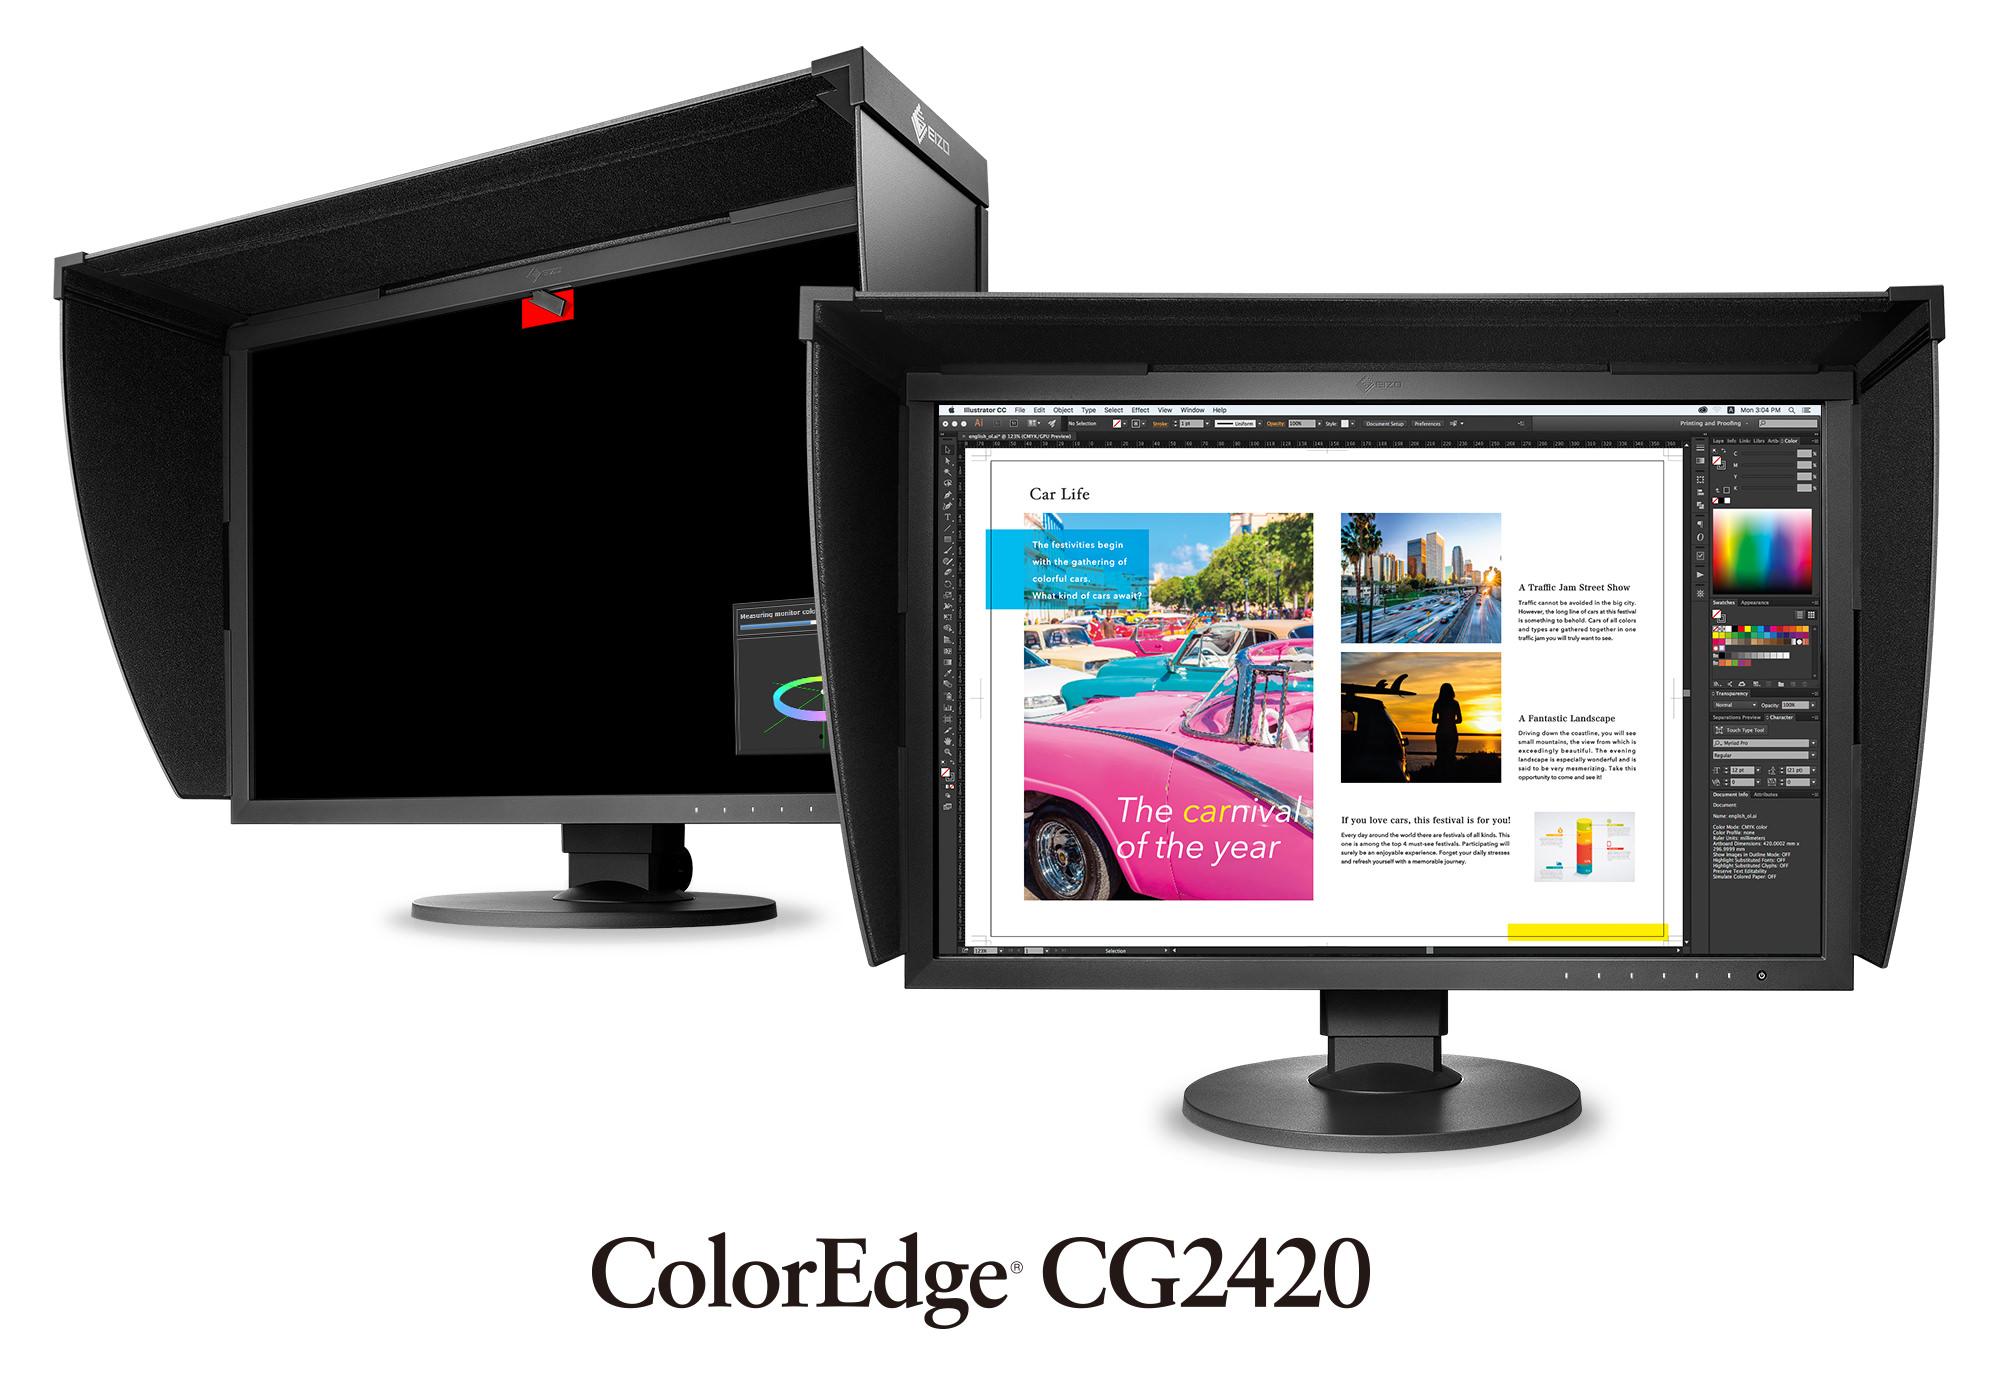 CG2420